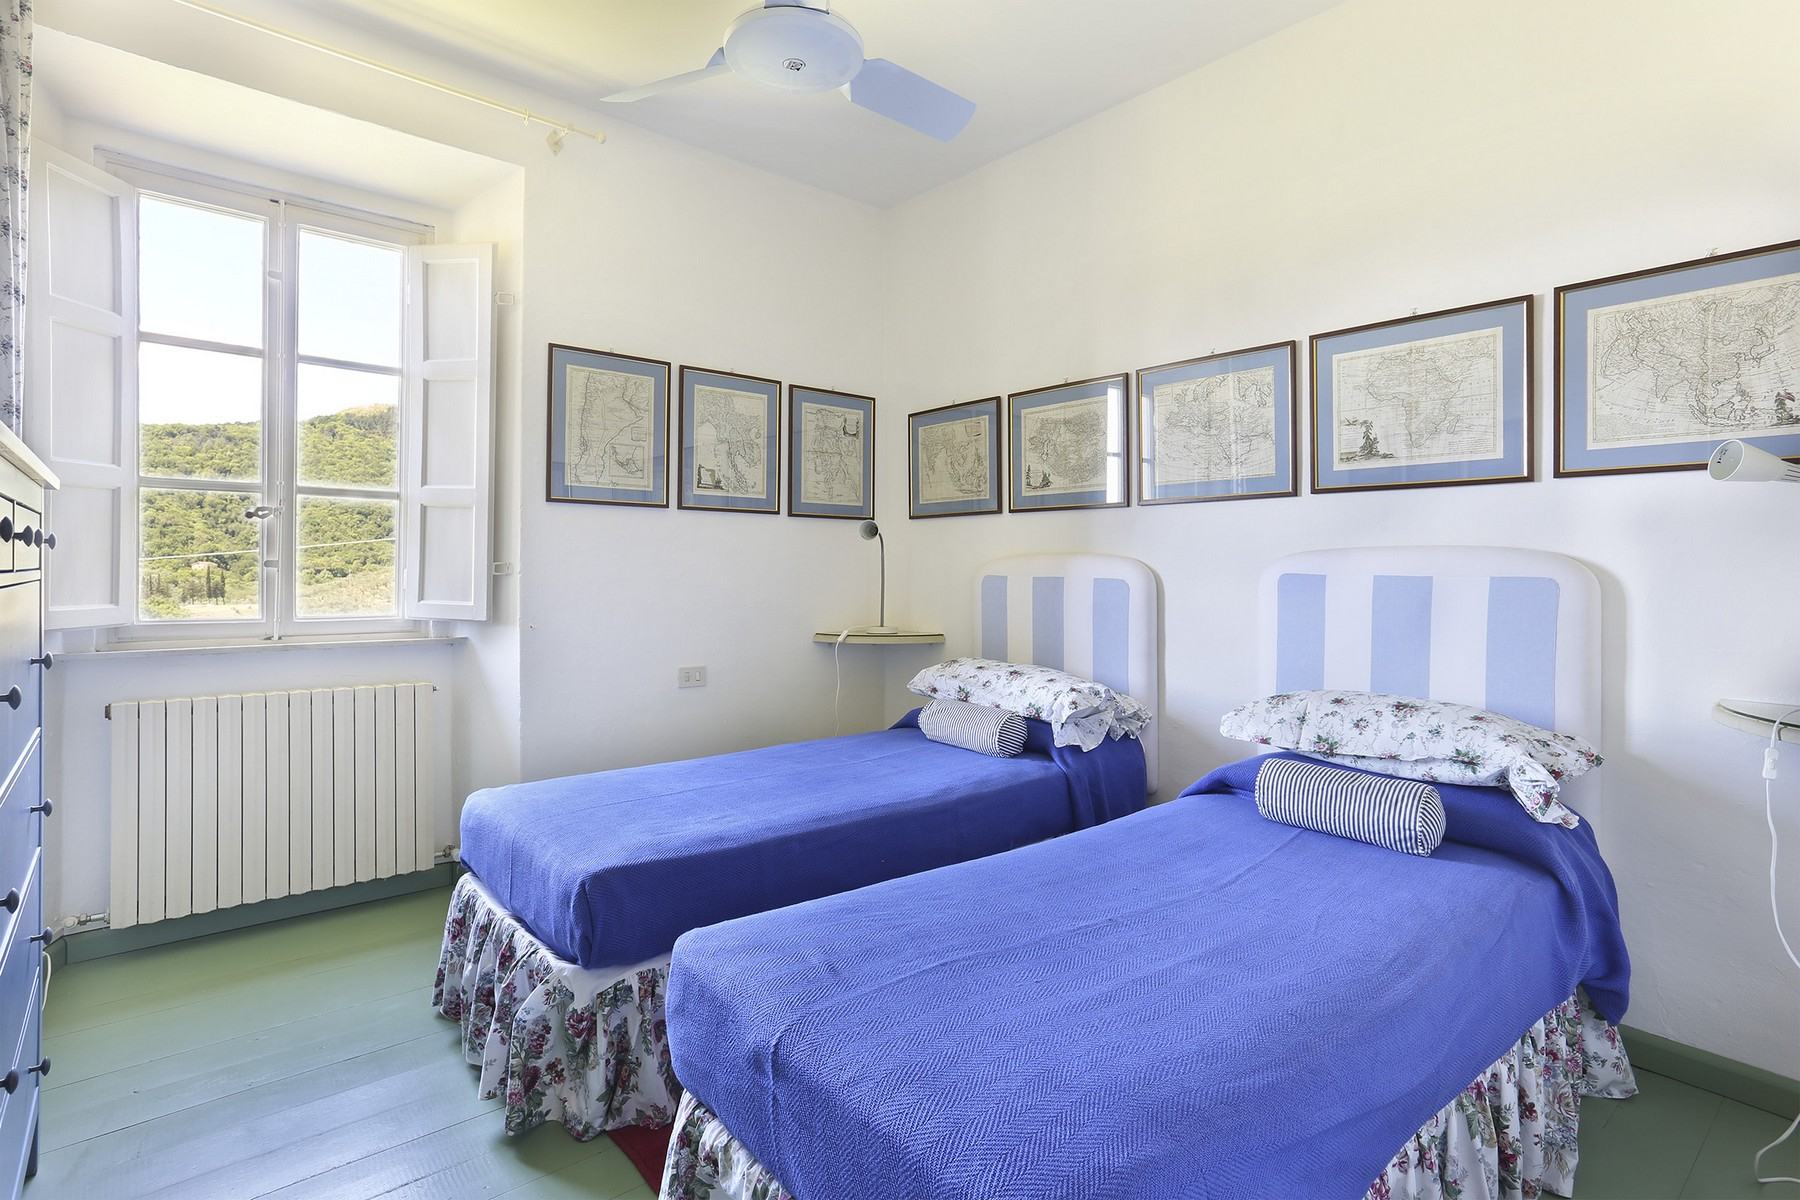 Villa in Vendita a Lucca: 5 locali, 735 mq - Foto 12